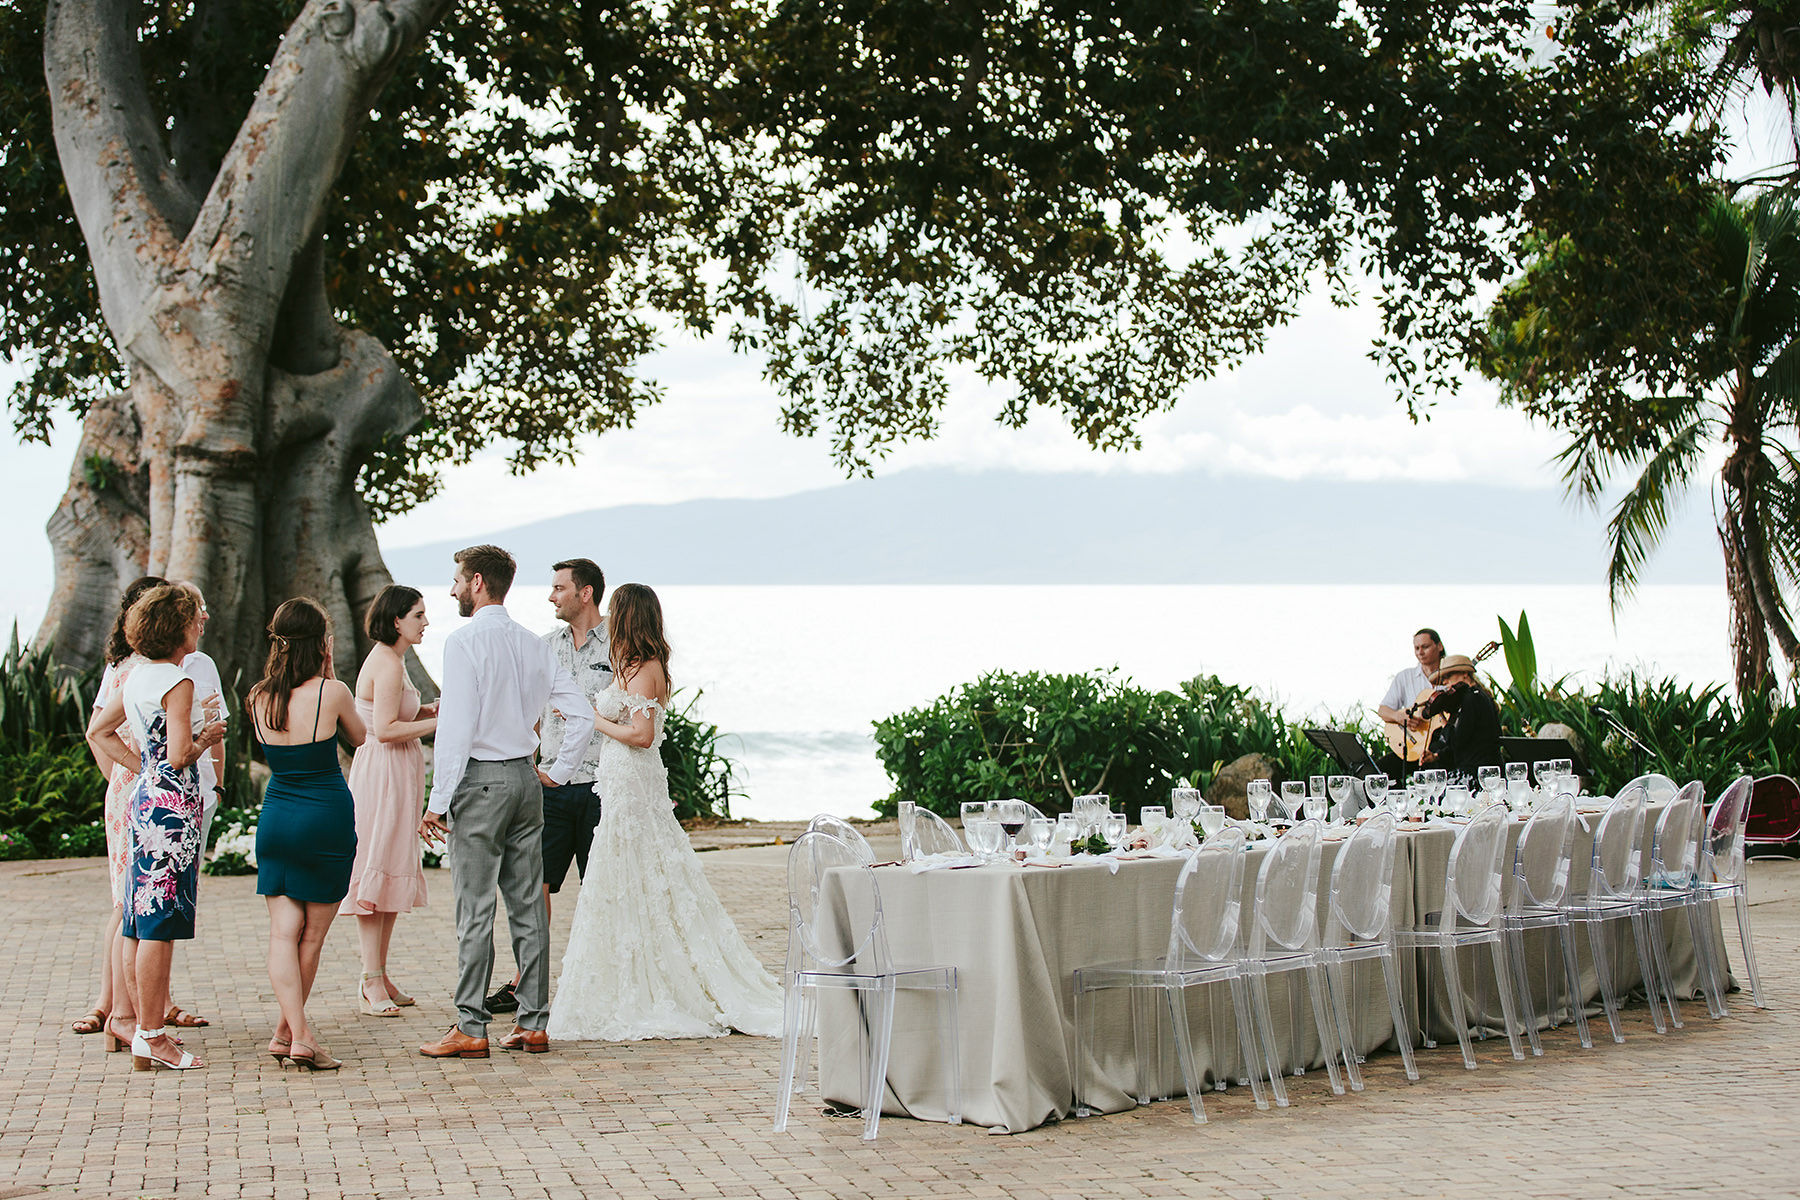 cocktail hour at a micro wedding at Olowalu Plantation House Maui